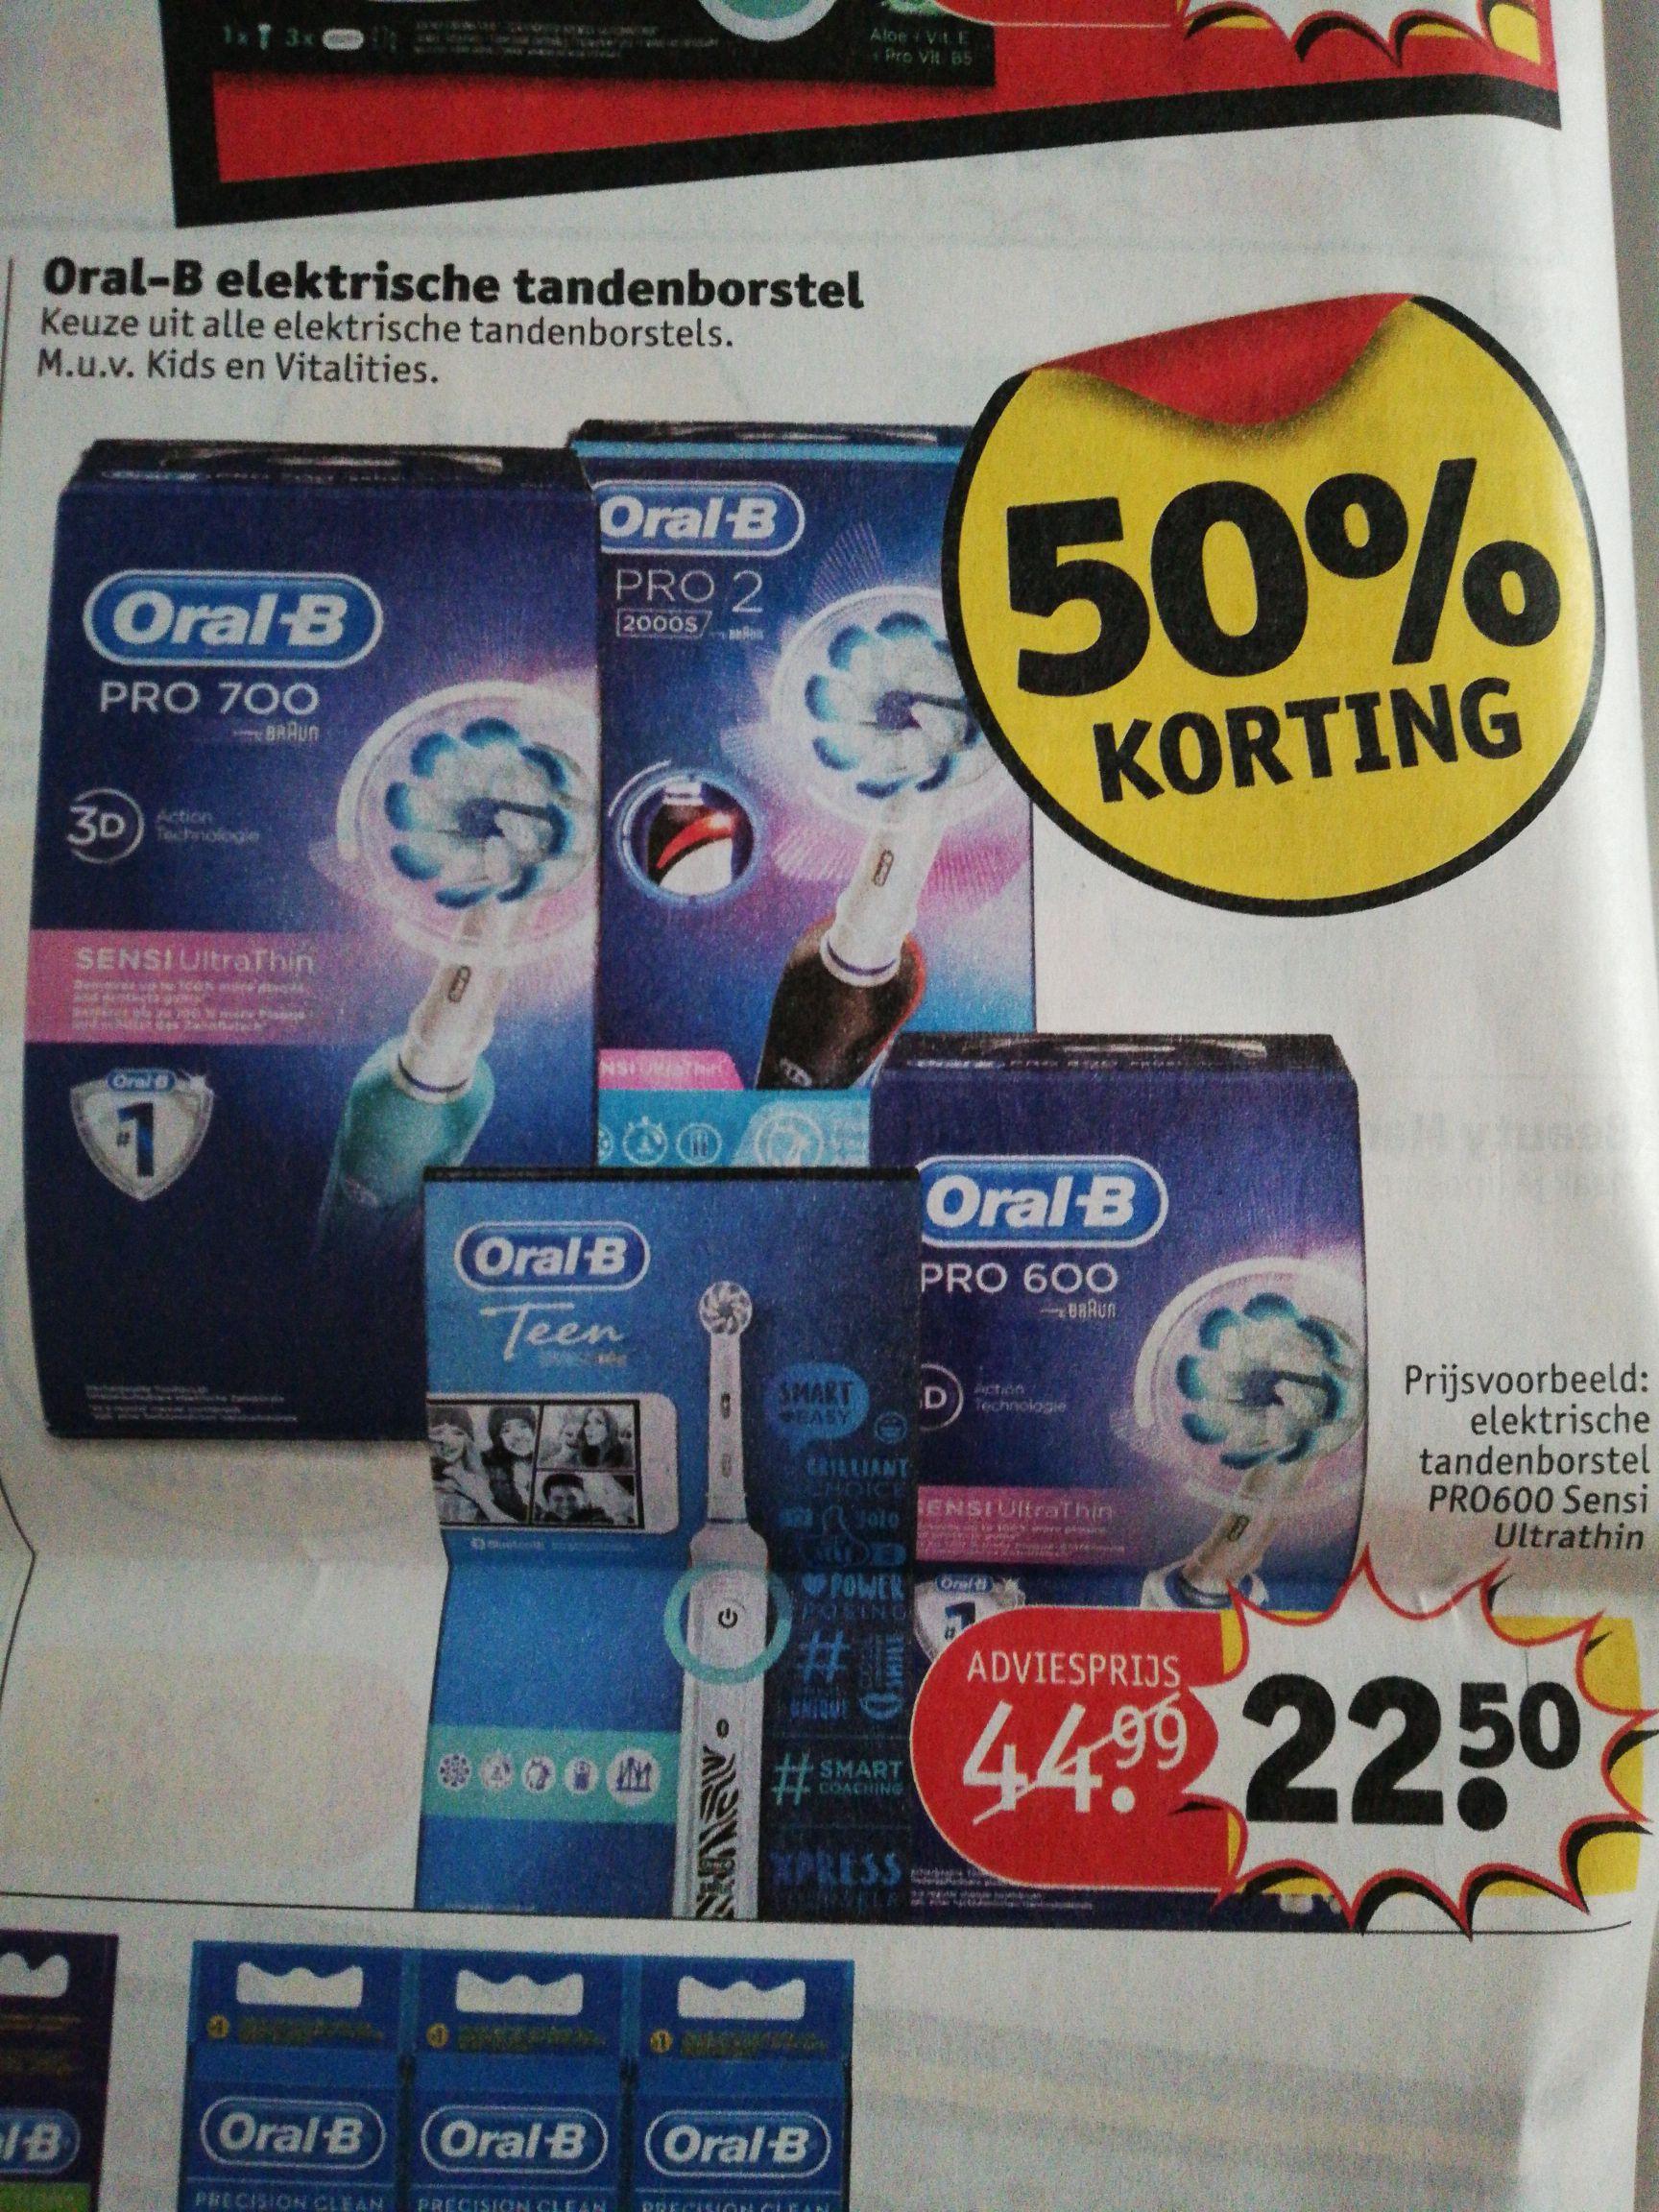 50% korting op alle* Oral-B elektrische tandenborstels @kruidvat